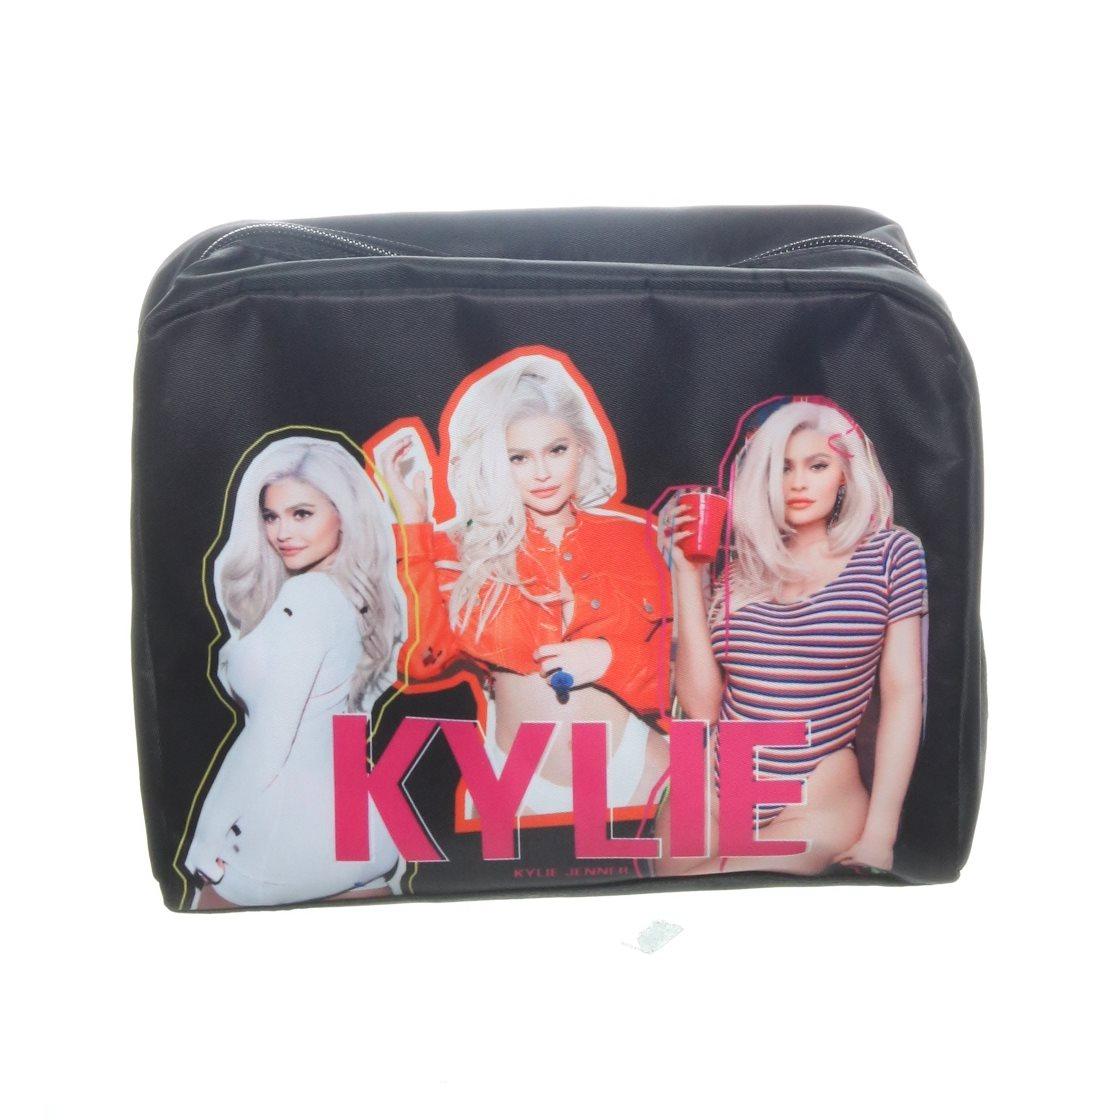 Kylie Cosmetics 0fba1ddba83d8